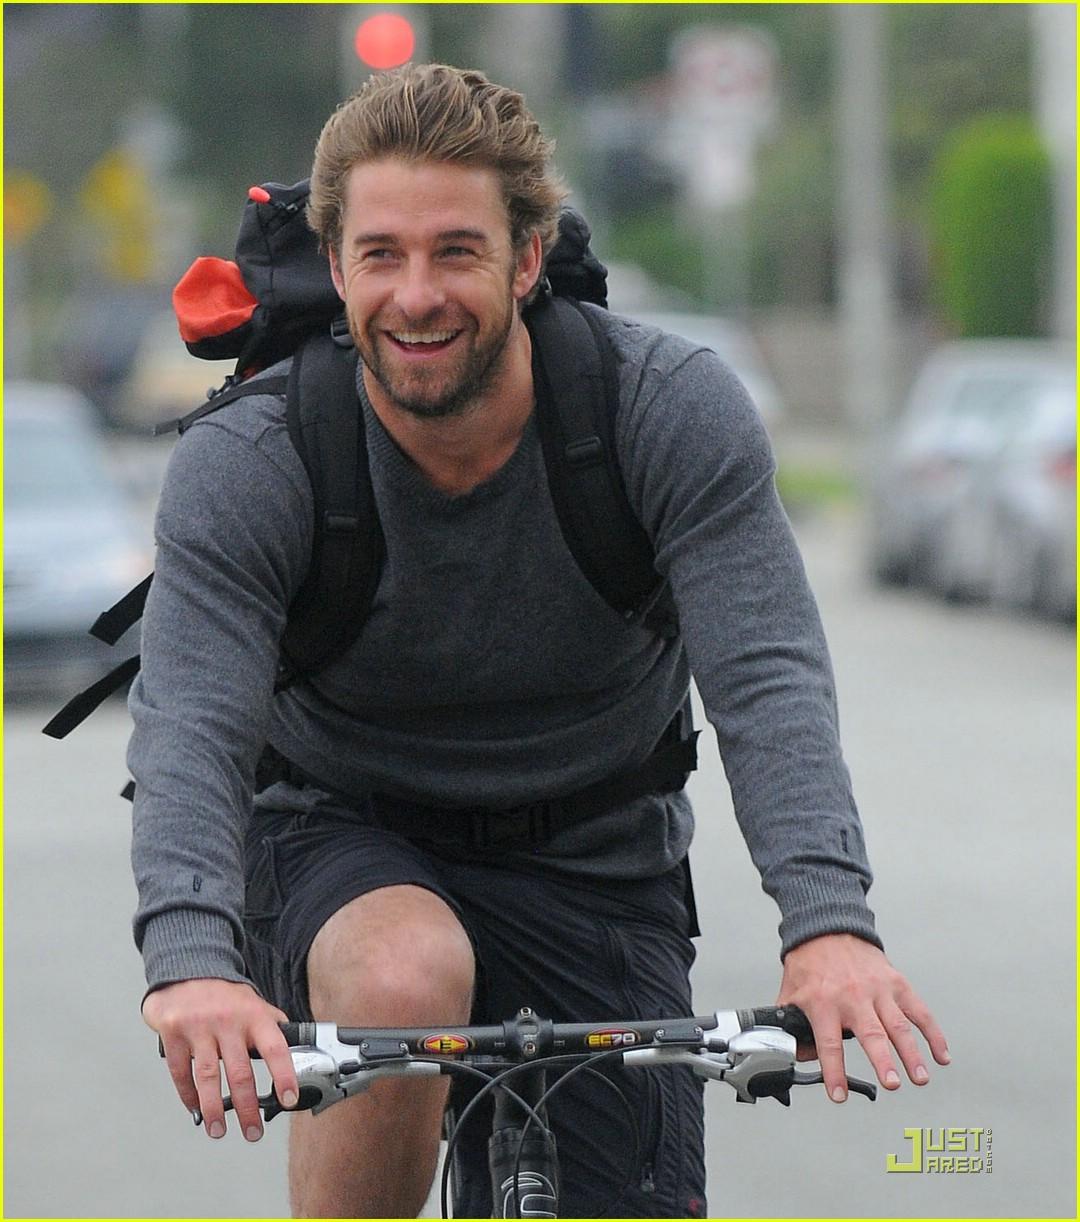 Full Sized Photo of scott speedman bicycle 08 | Photo ... Scott Speedman Body